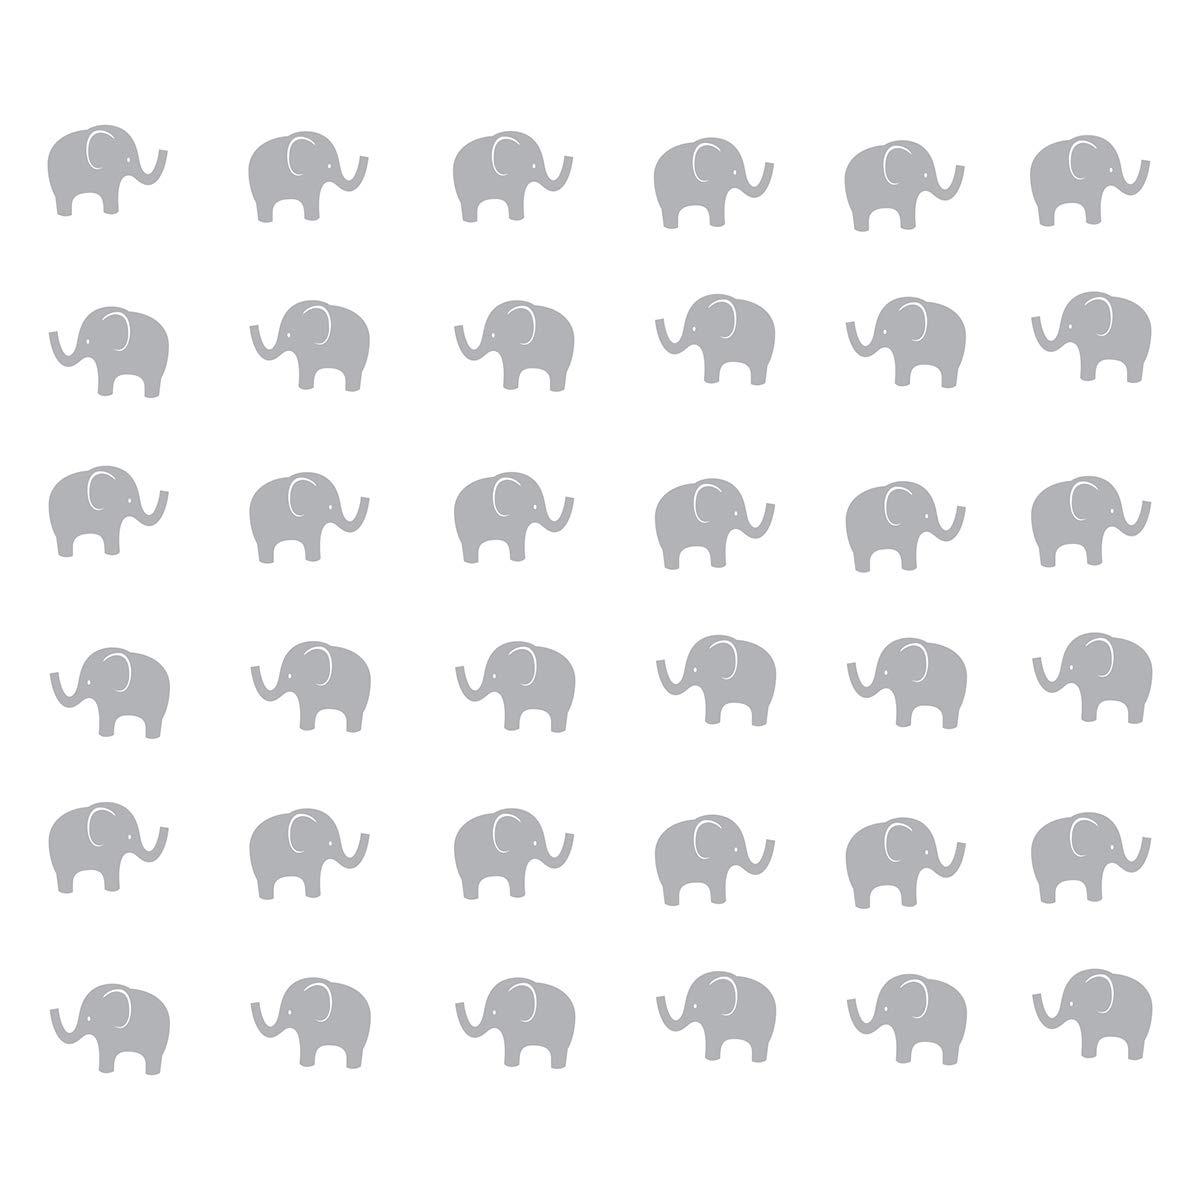 JUEKUI Set of 48pcs Baby Elephant Wall Decals Woodland Elephant Wall Decor Stickers for Kids Bedroom Nursery Decor Removable Vinyl WS15 (Gray)